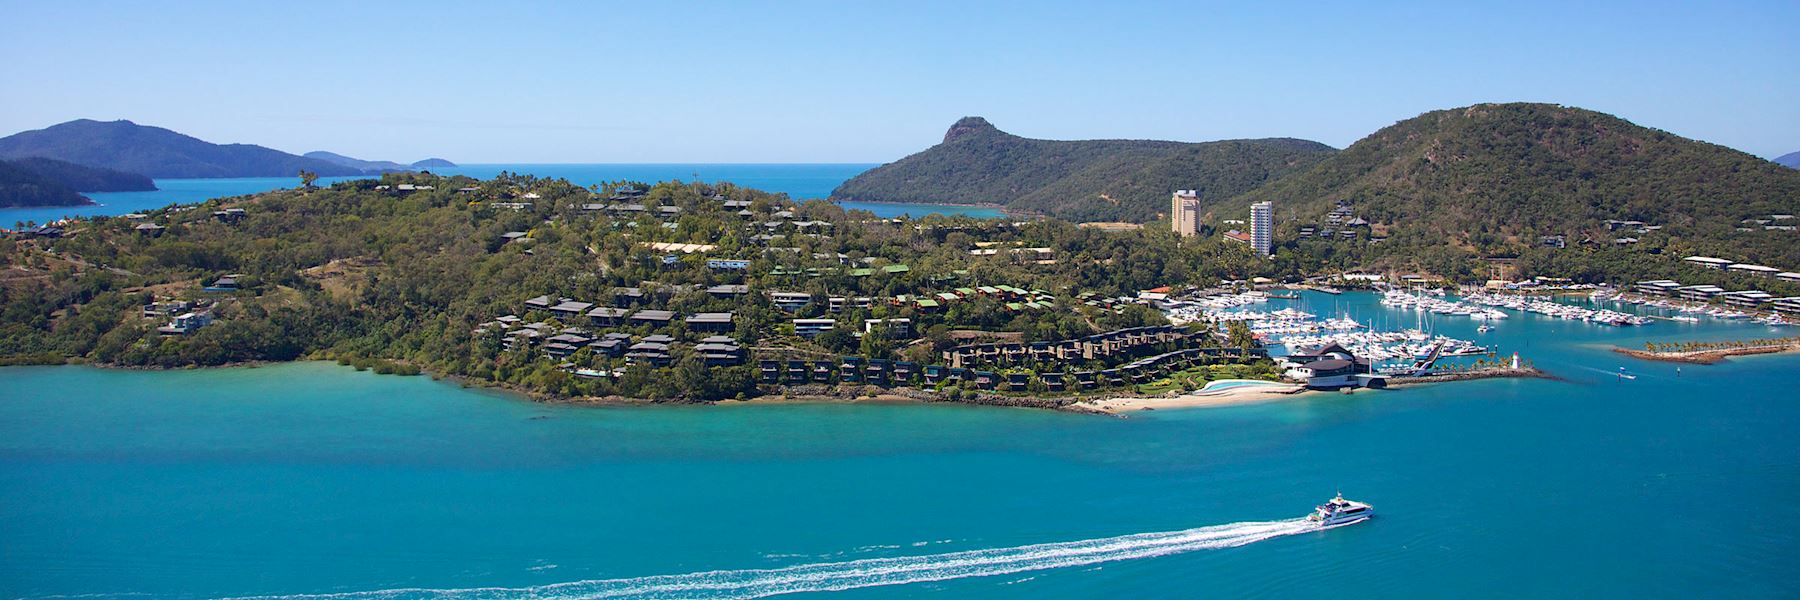 Visit Hamilton Island, Australia